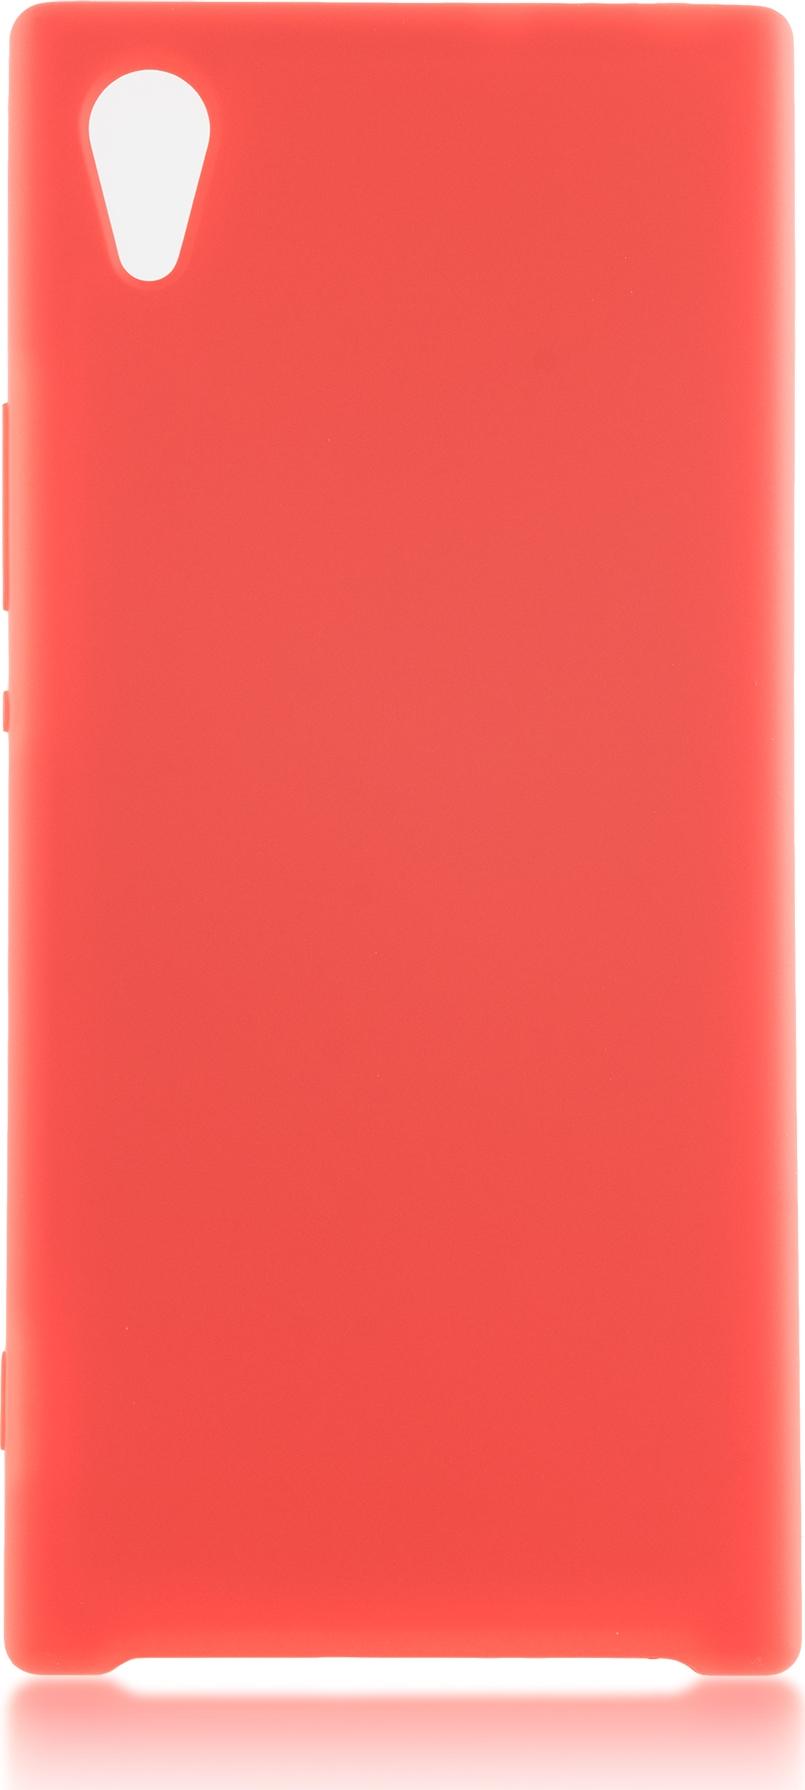 Чехол Brosco Softrubber для Sony Xperia XA1, красный цена и фото